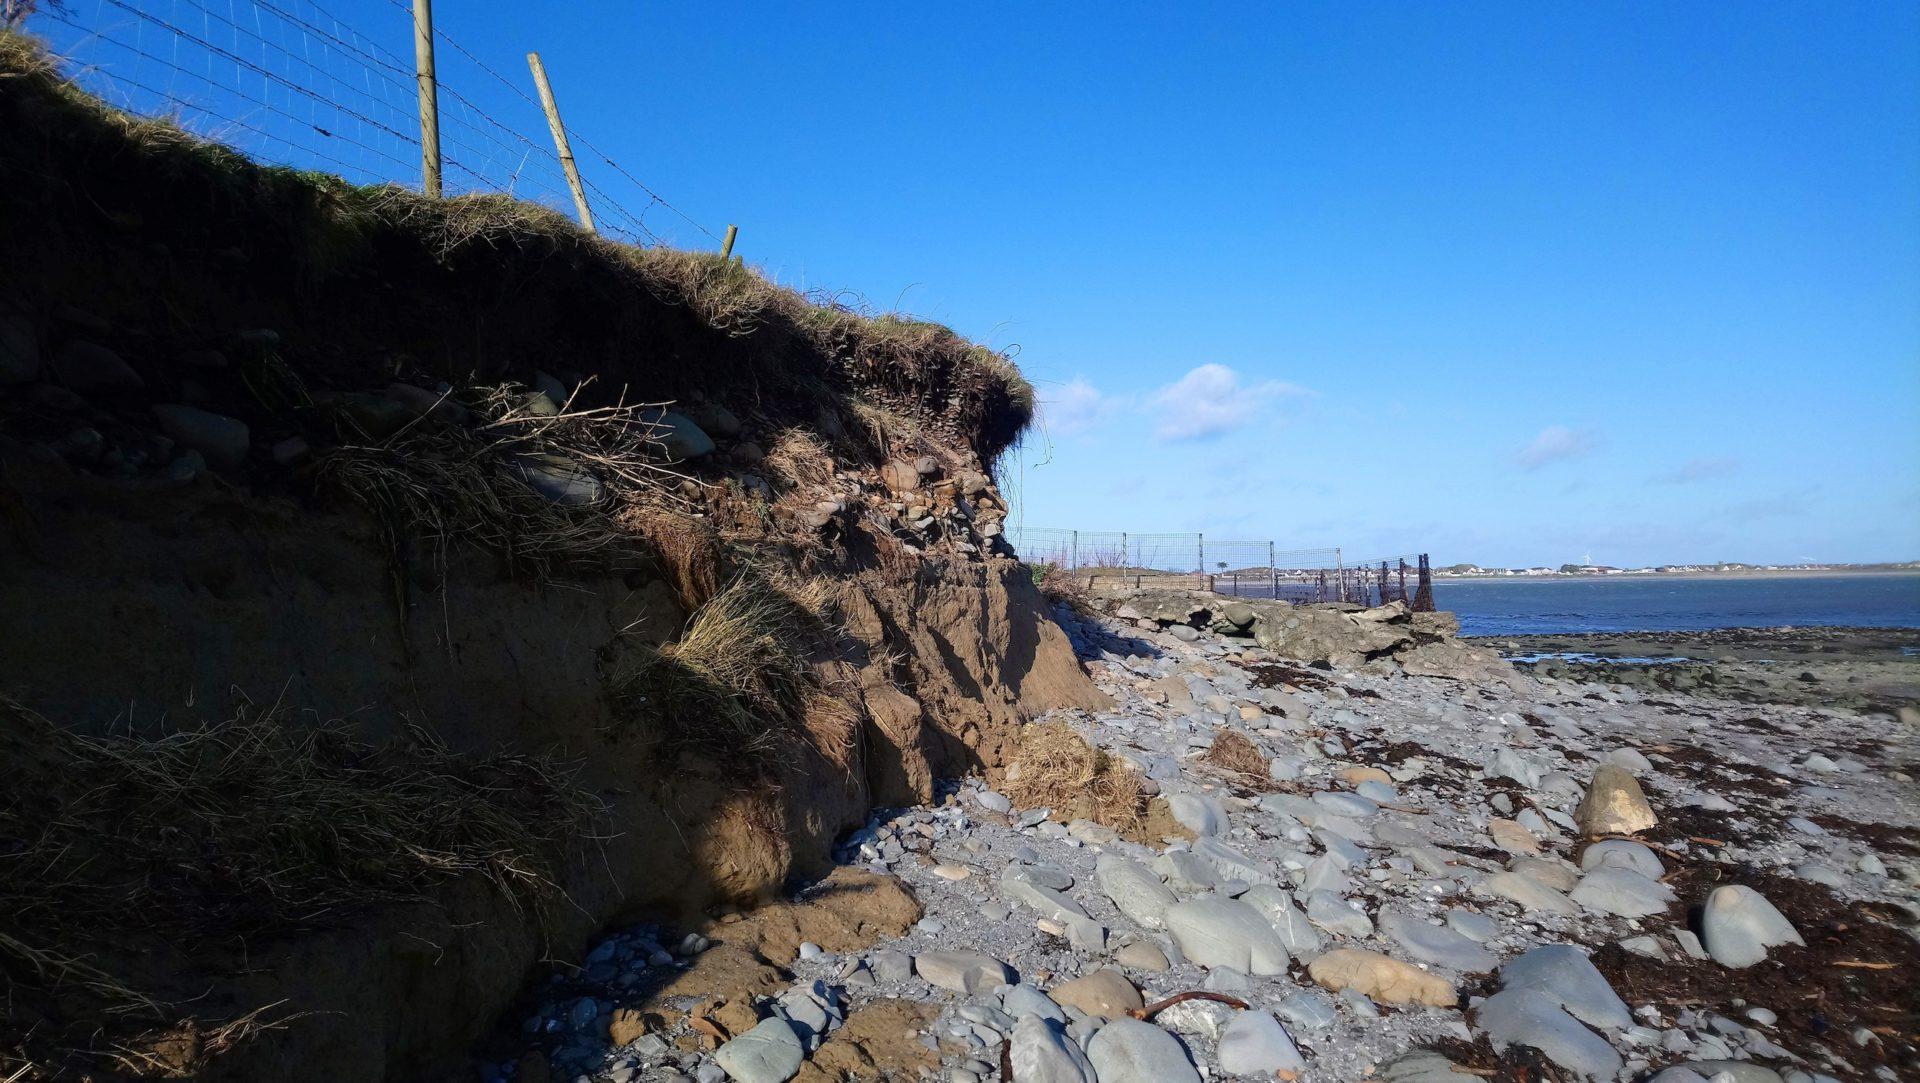 More Coastal Erosion at Slanes Point